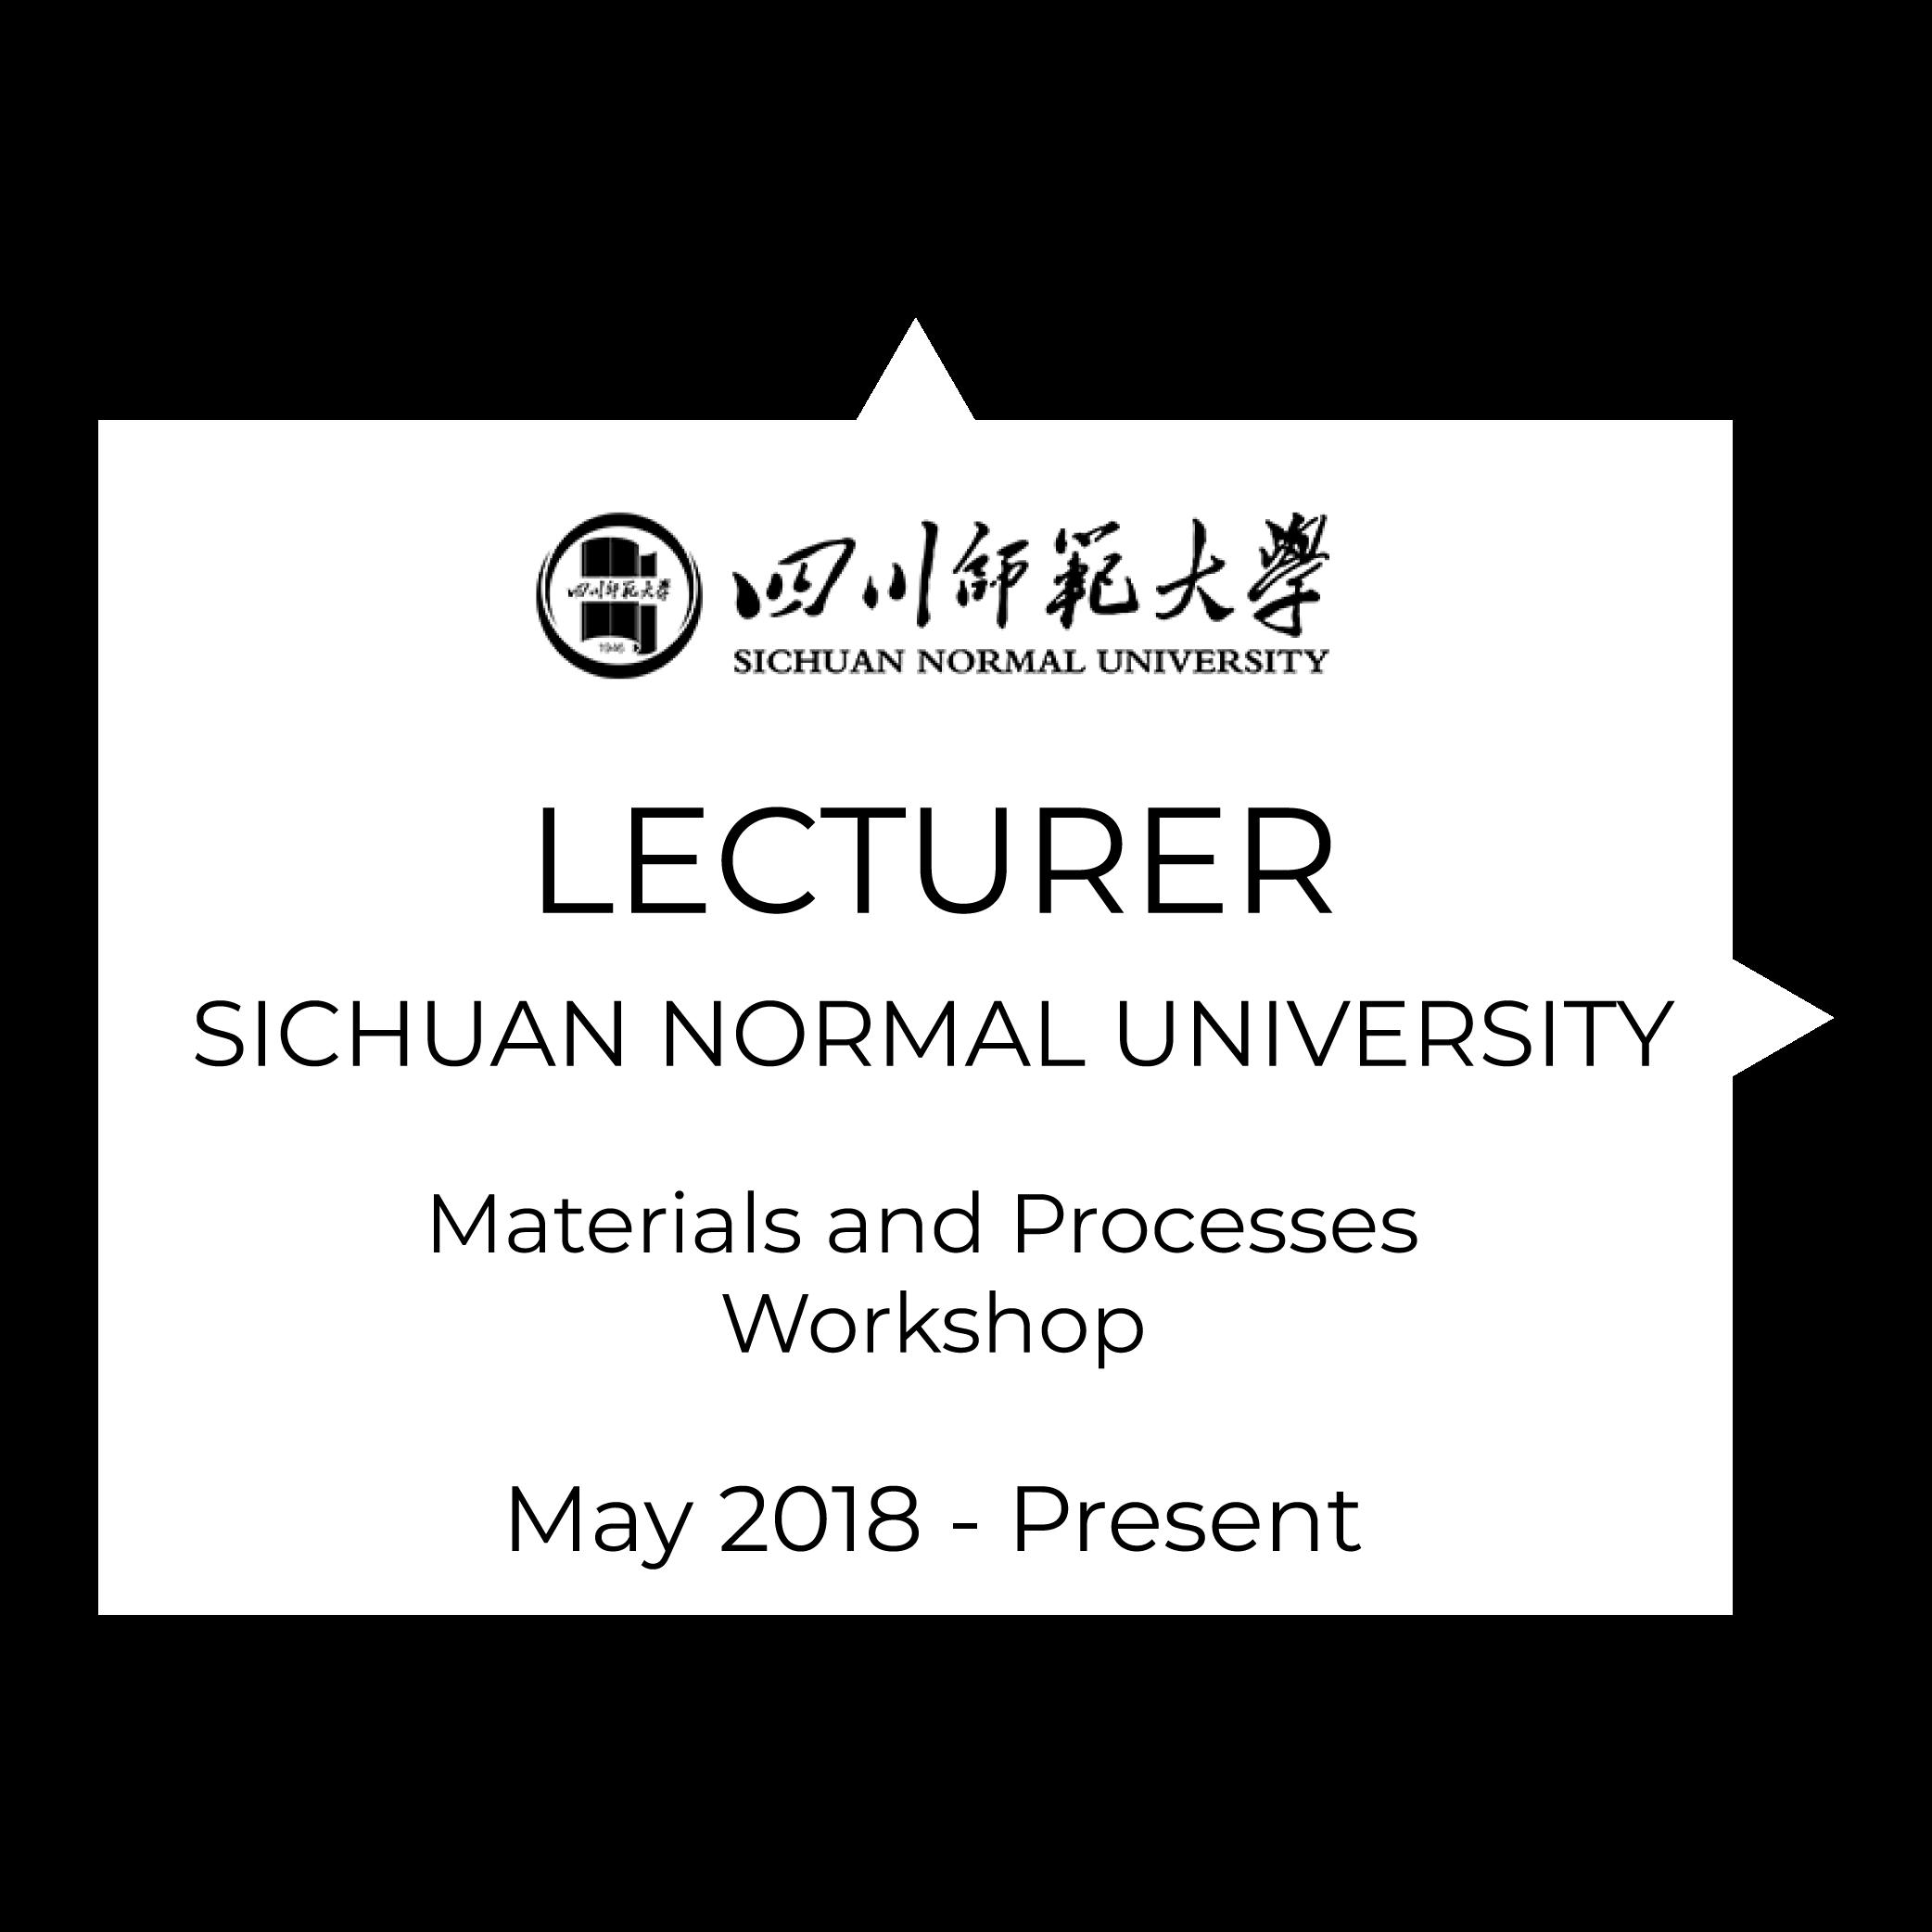 Resume-Lecturer_SNU_China-Marco-Bonanni